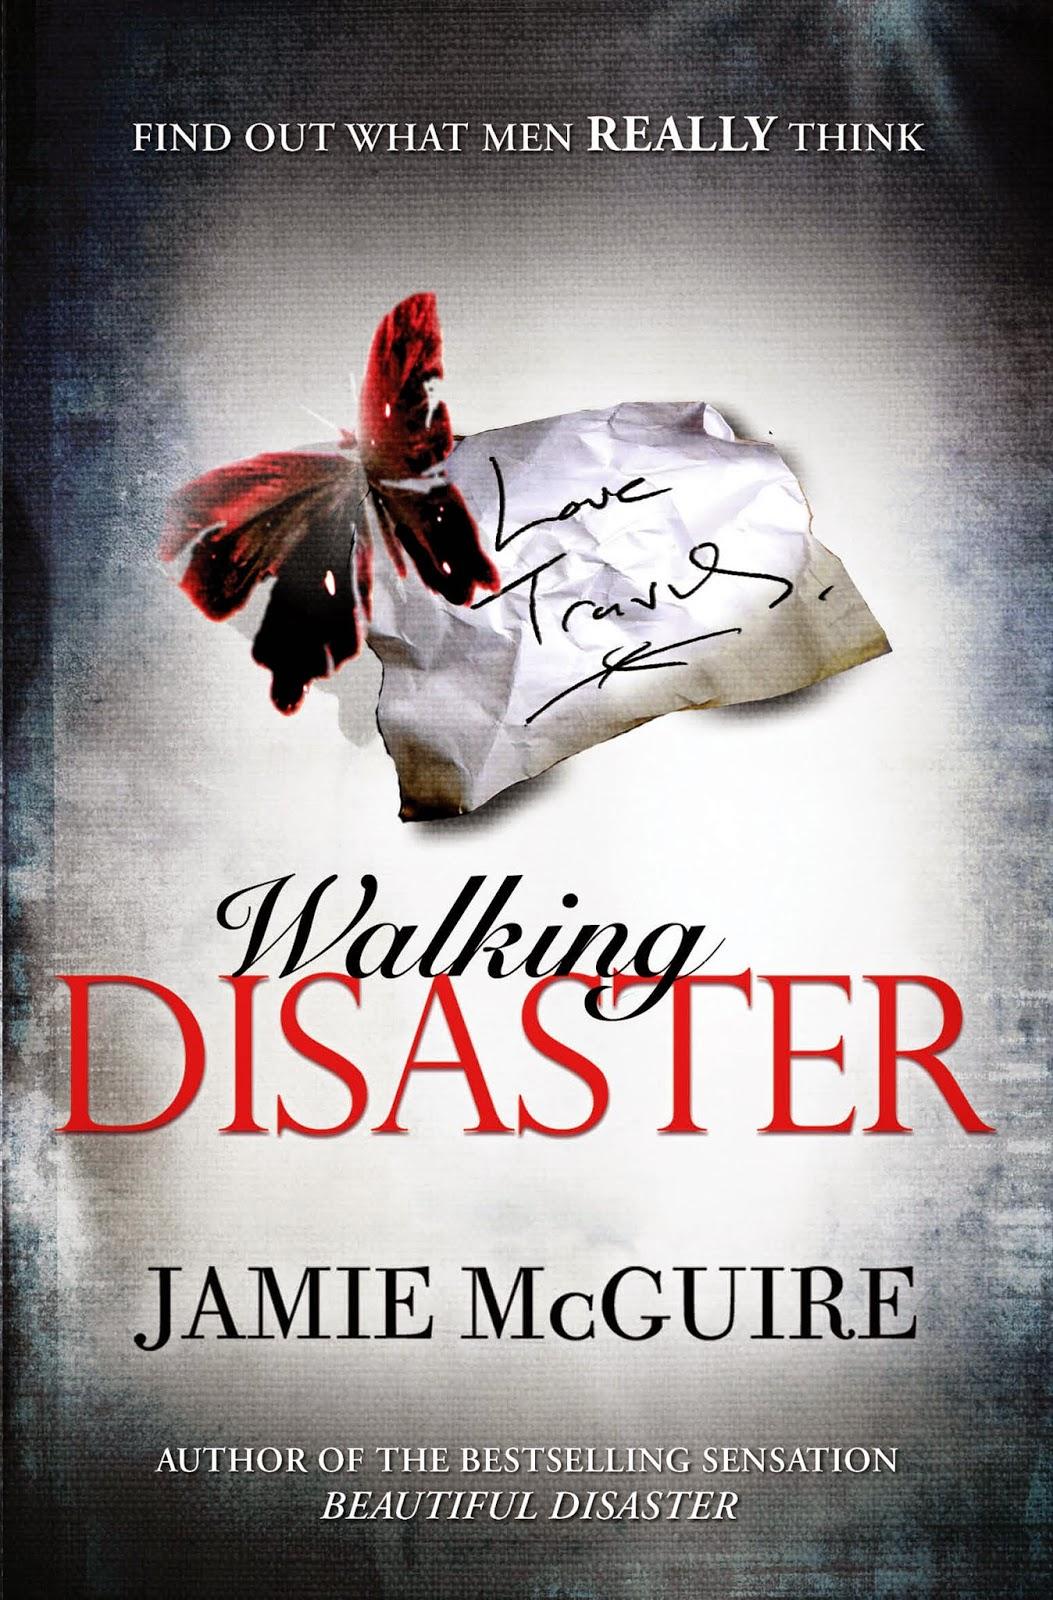 [PDF] Beautiful Disaster Book by Jamie McGuire Free ...